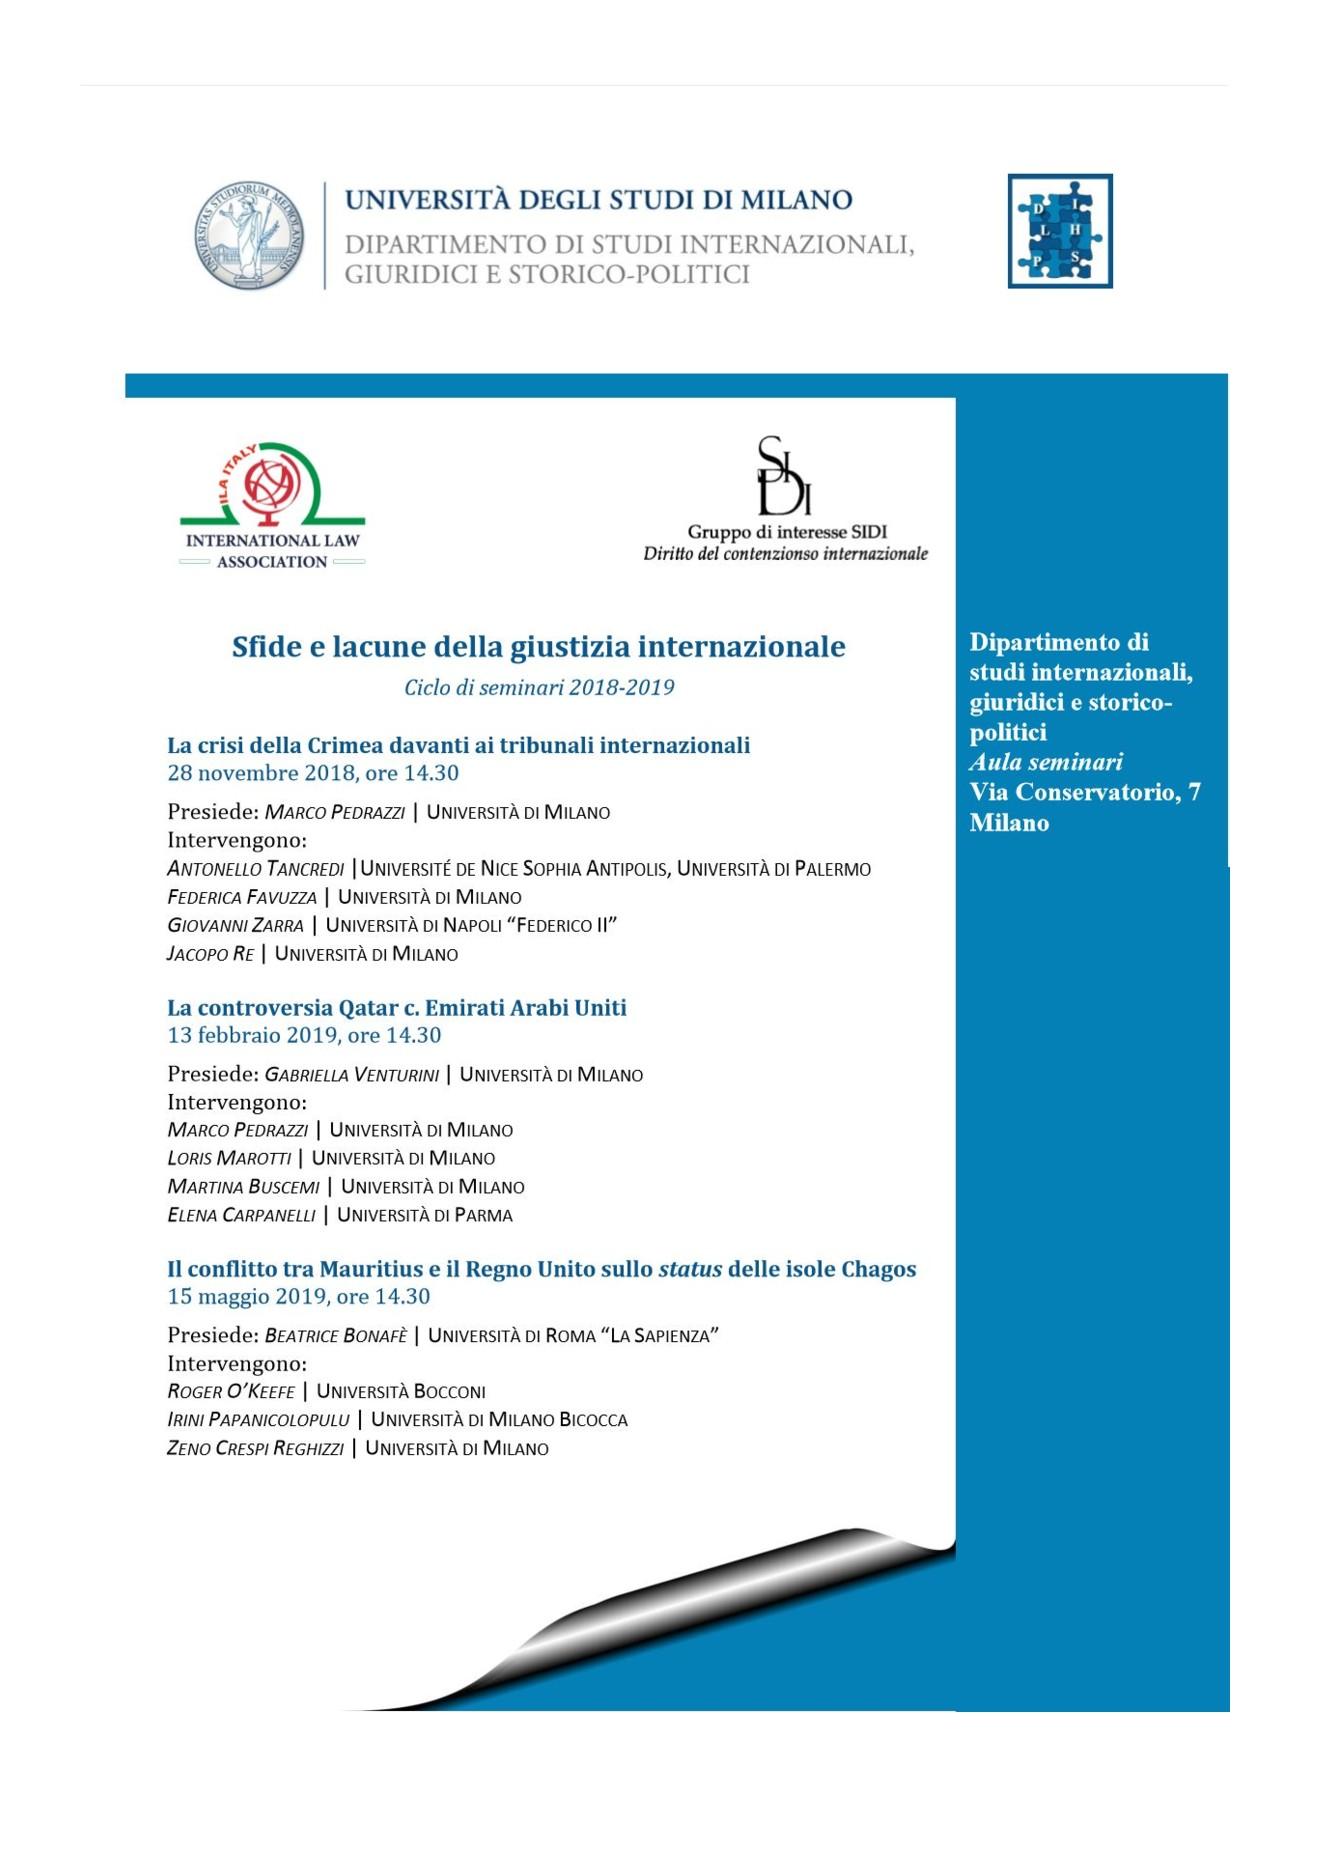 ILA Italian Branch: 2nd Seminar on International Justice - La controversia  Qatar c. Emirati Arabi Uniti